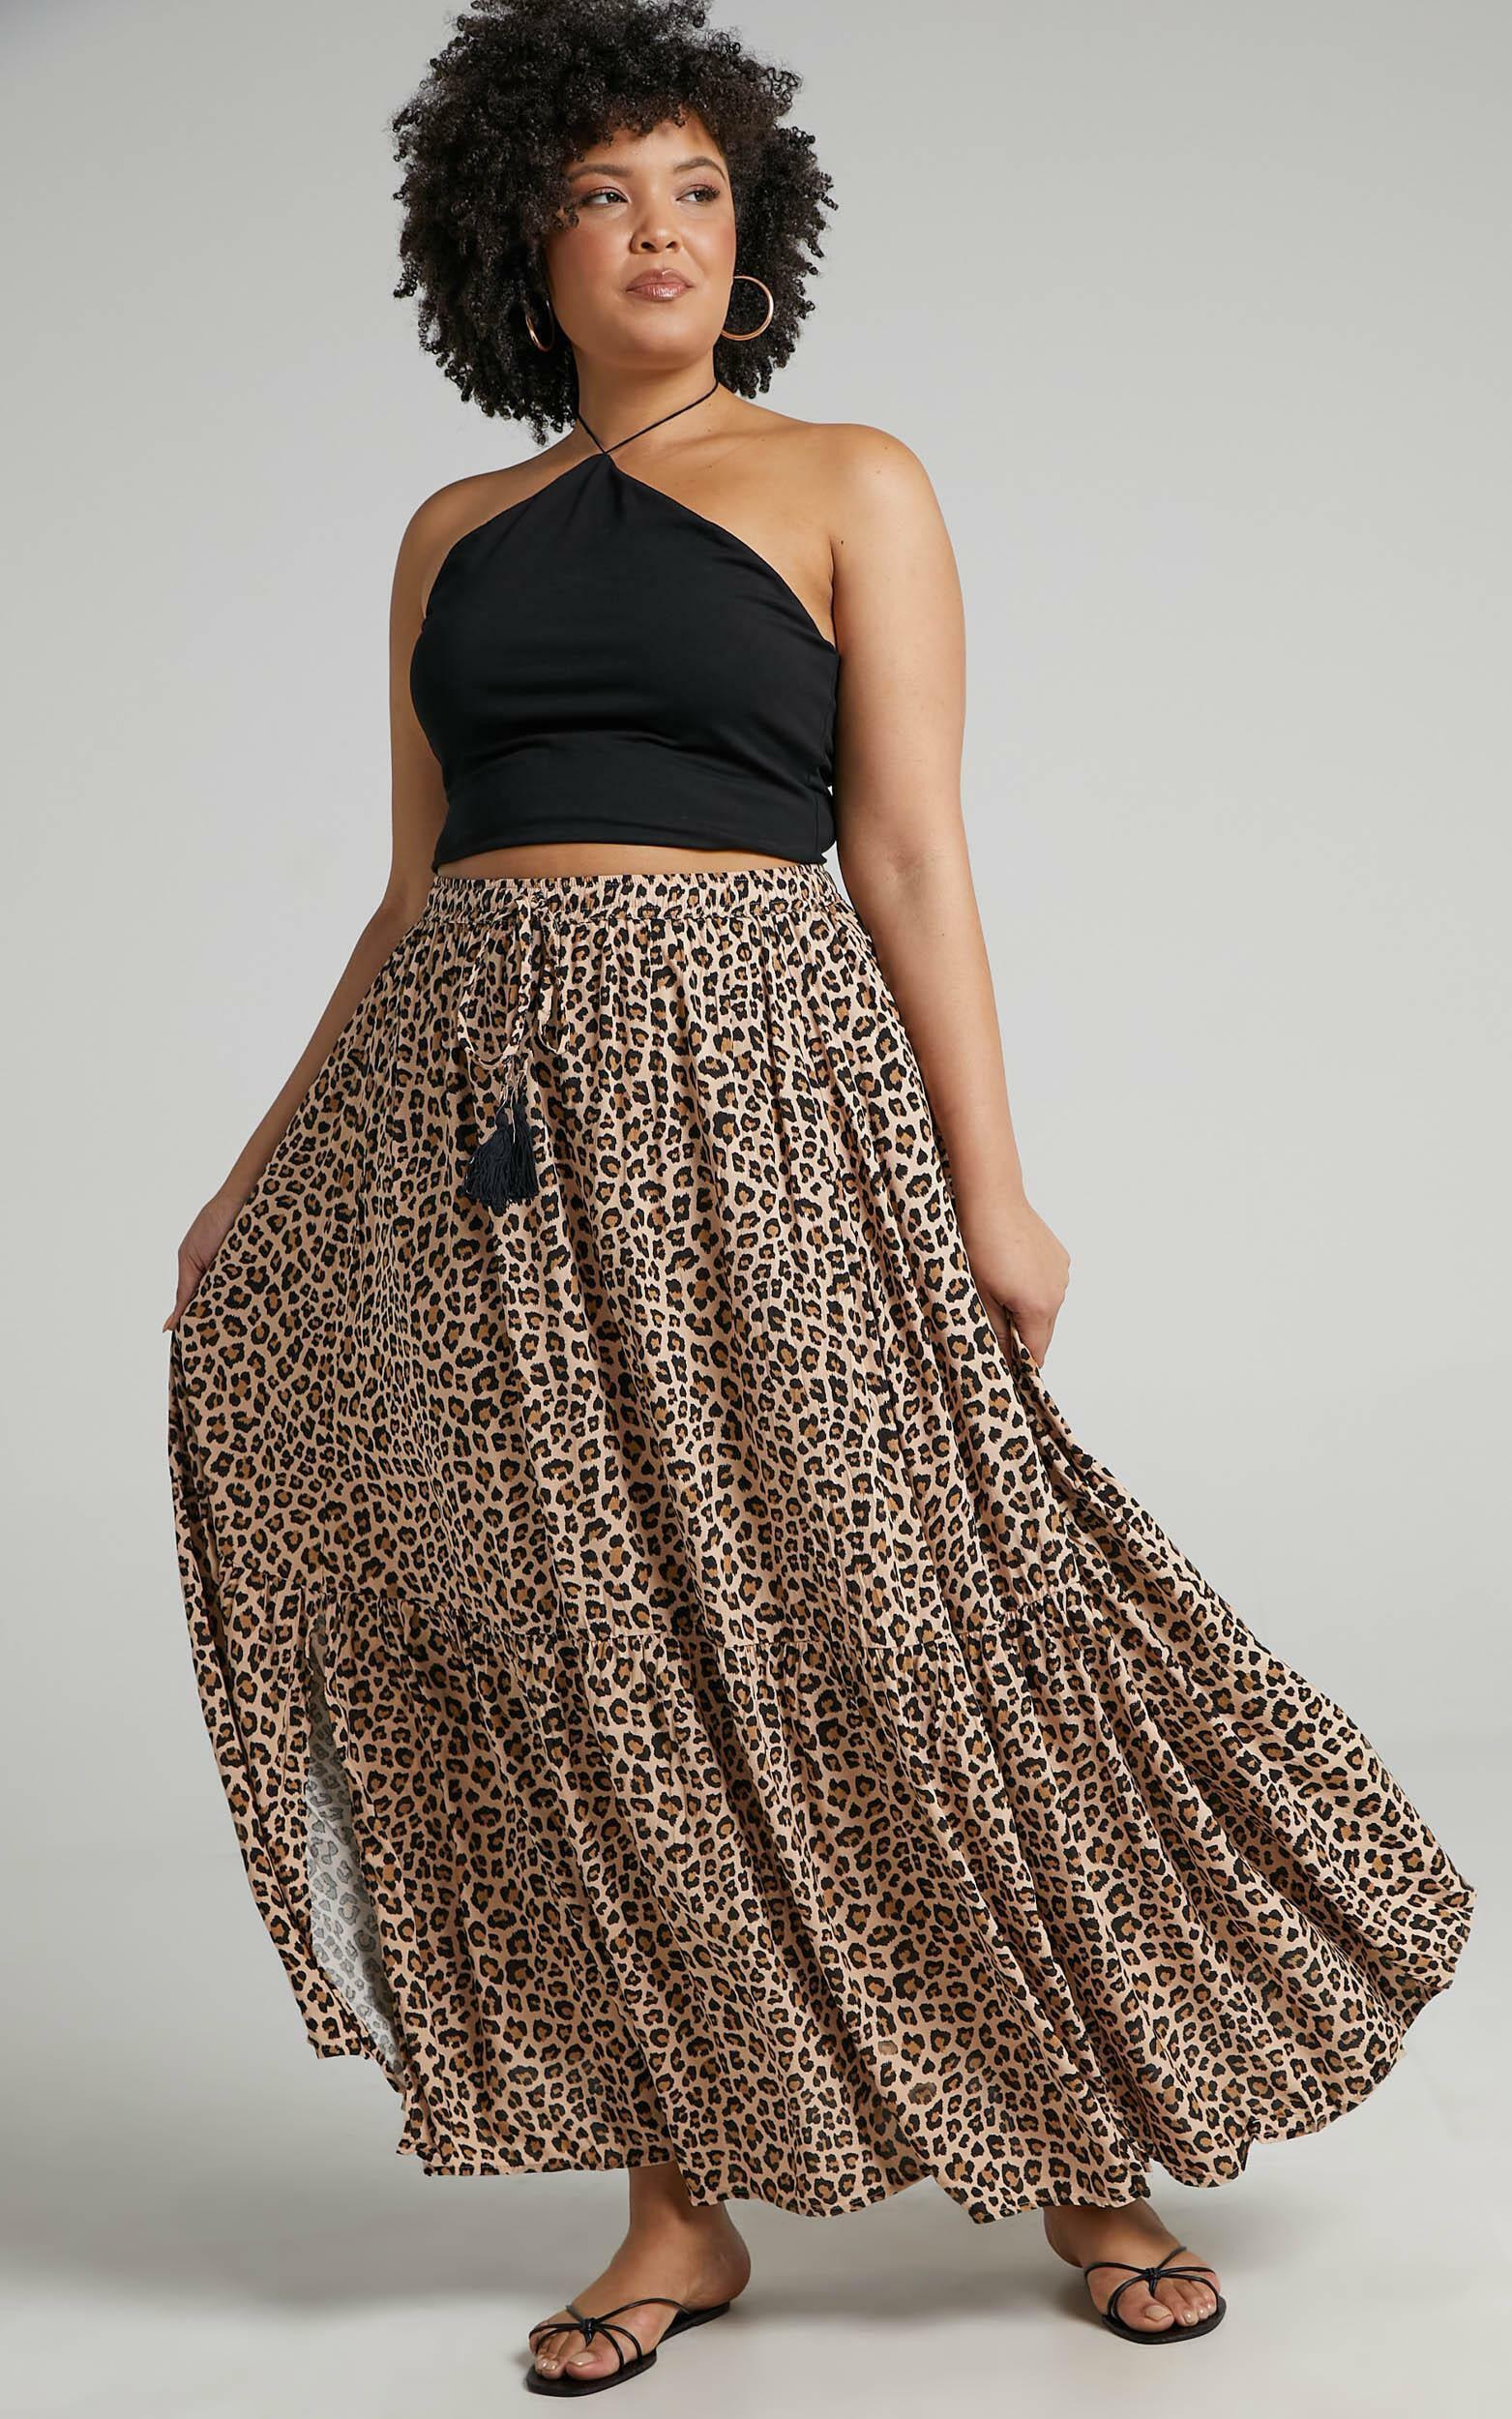 Off To Bali Skirt in Leopard Print - 06, BRN1, super-hi-res image number null